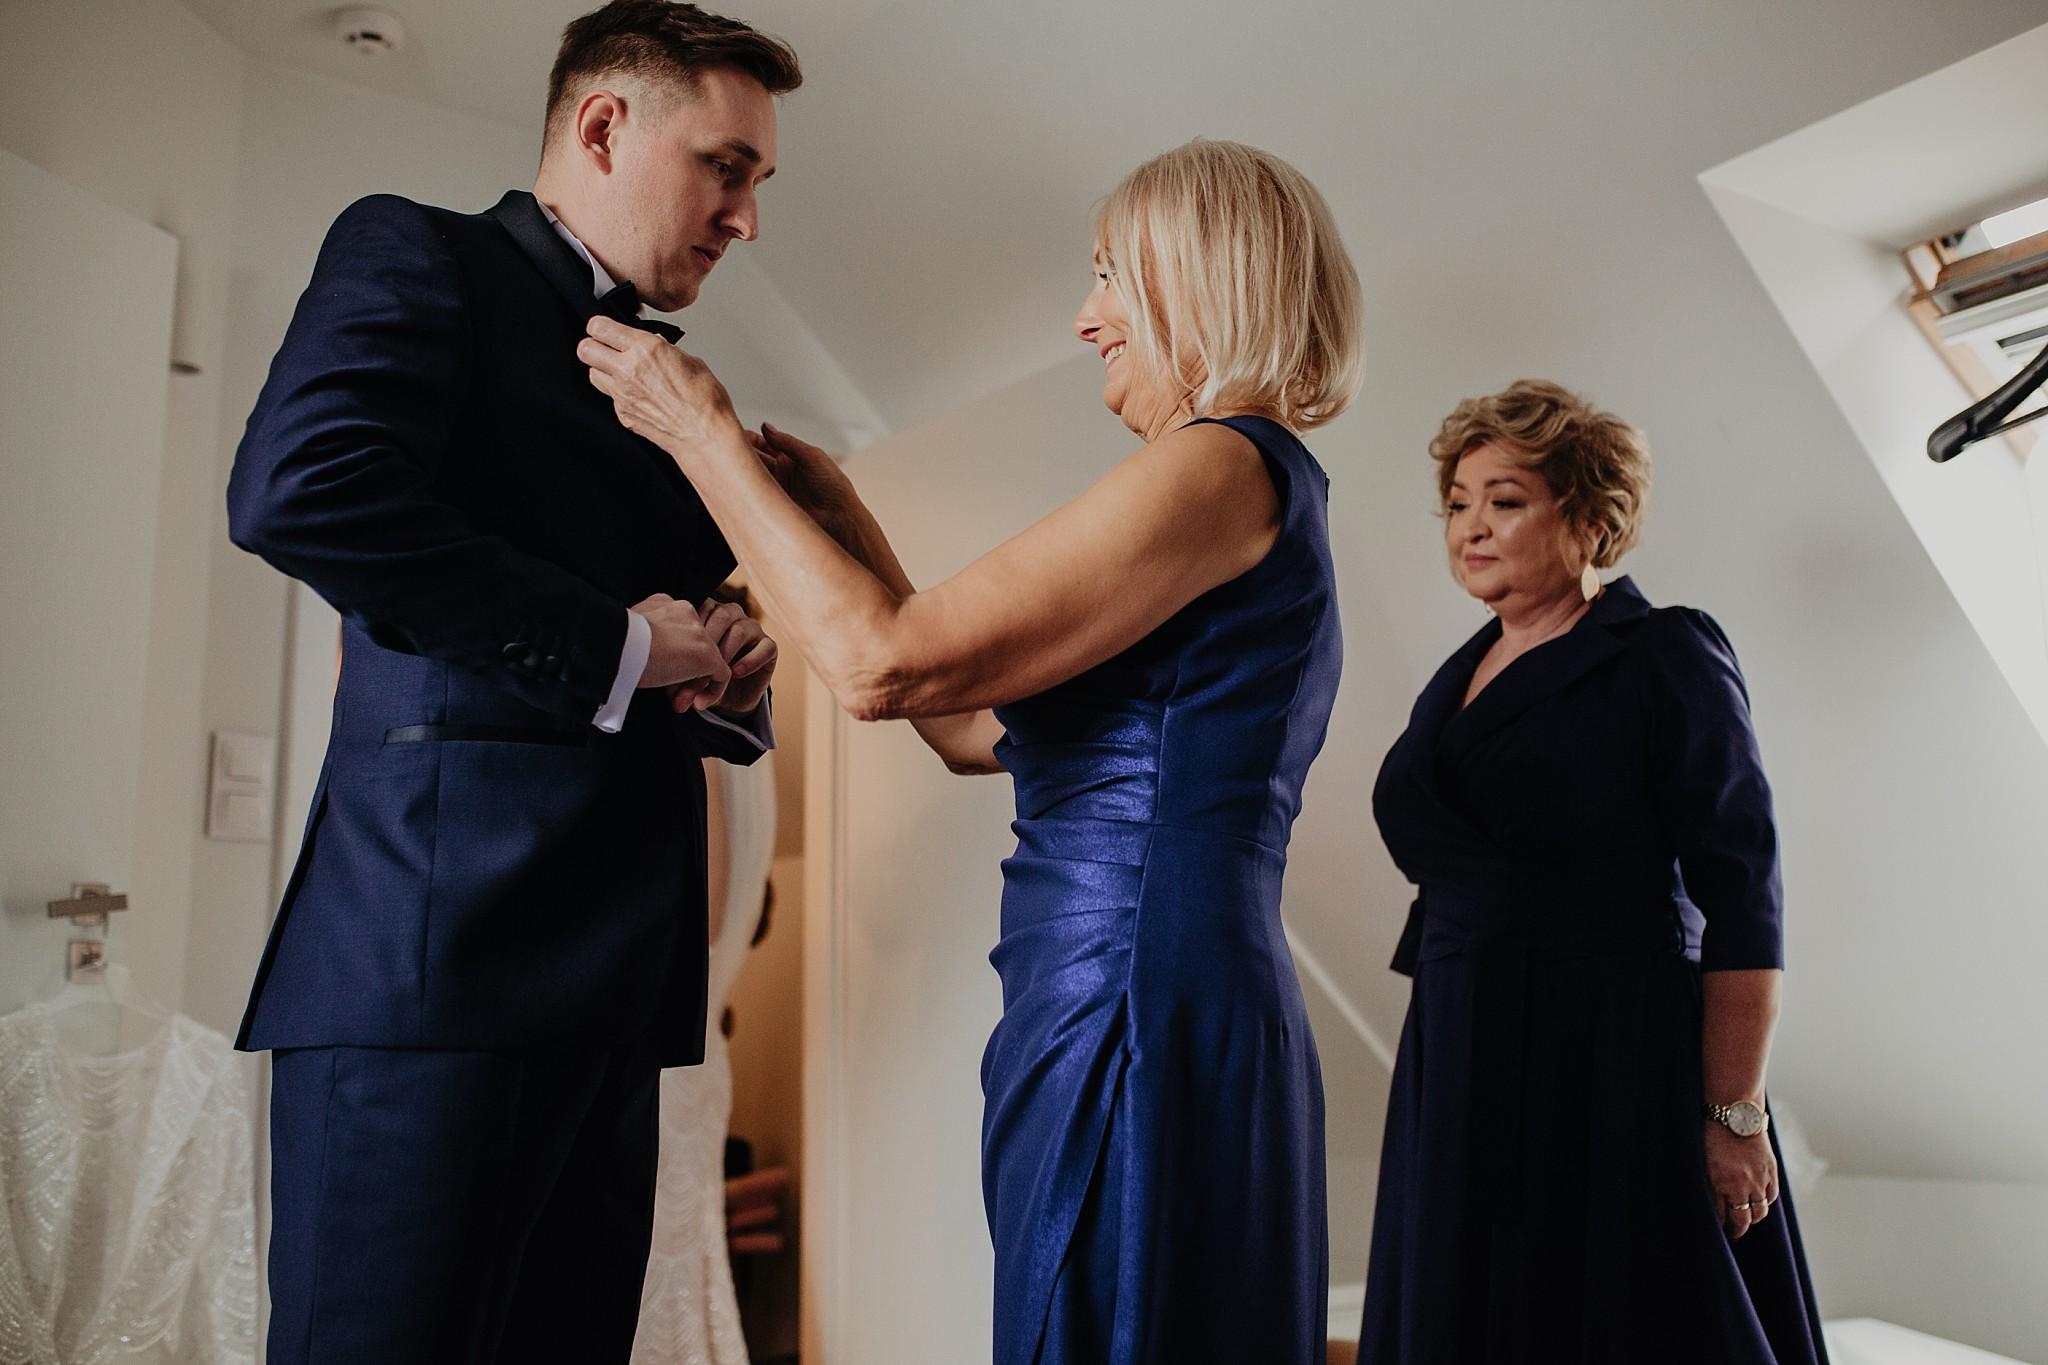 fotograf poznan wesele dobra truskawka piekne wesele pod poznaniem wesele w dobrej truskawce piekna para mloda slub marzen slub koronawirus slub listopad wesele koronawirus 079